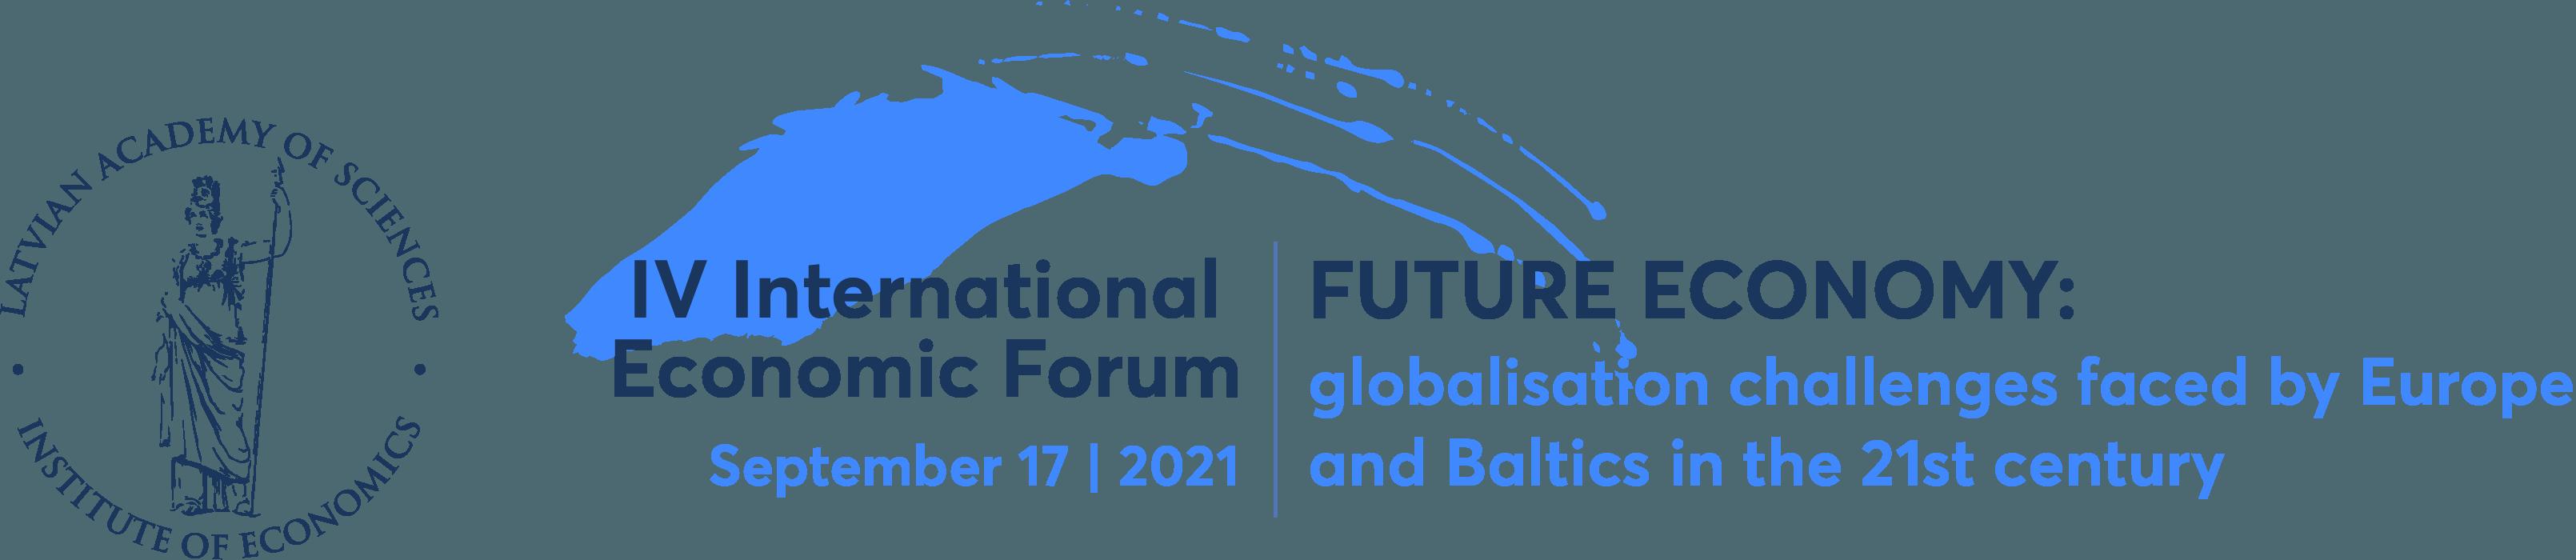 IV International Economic Forum